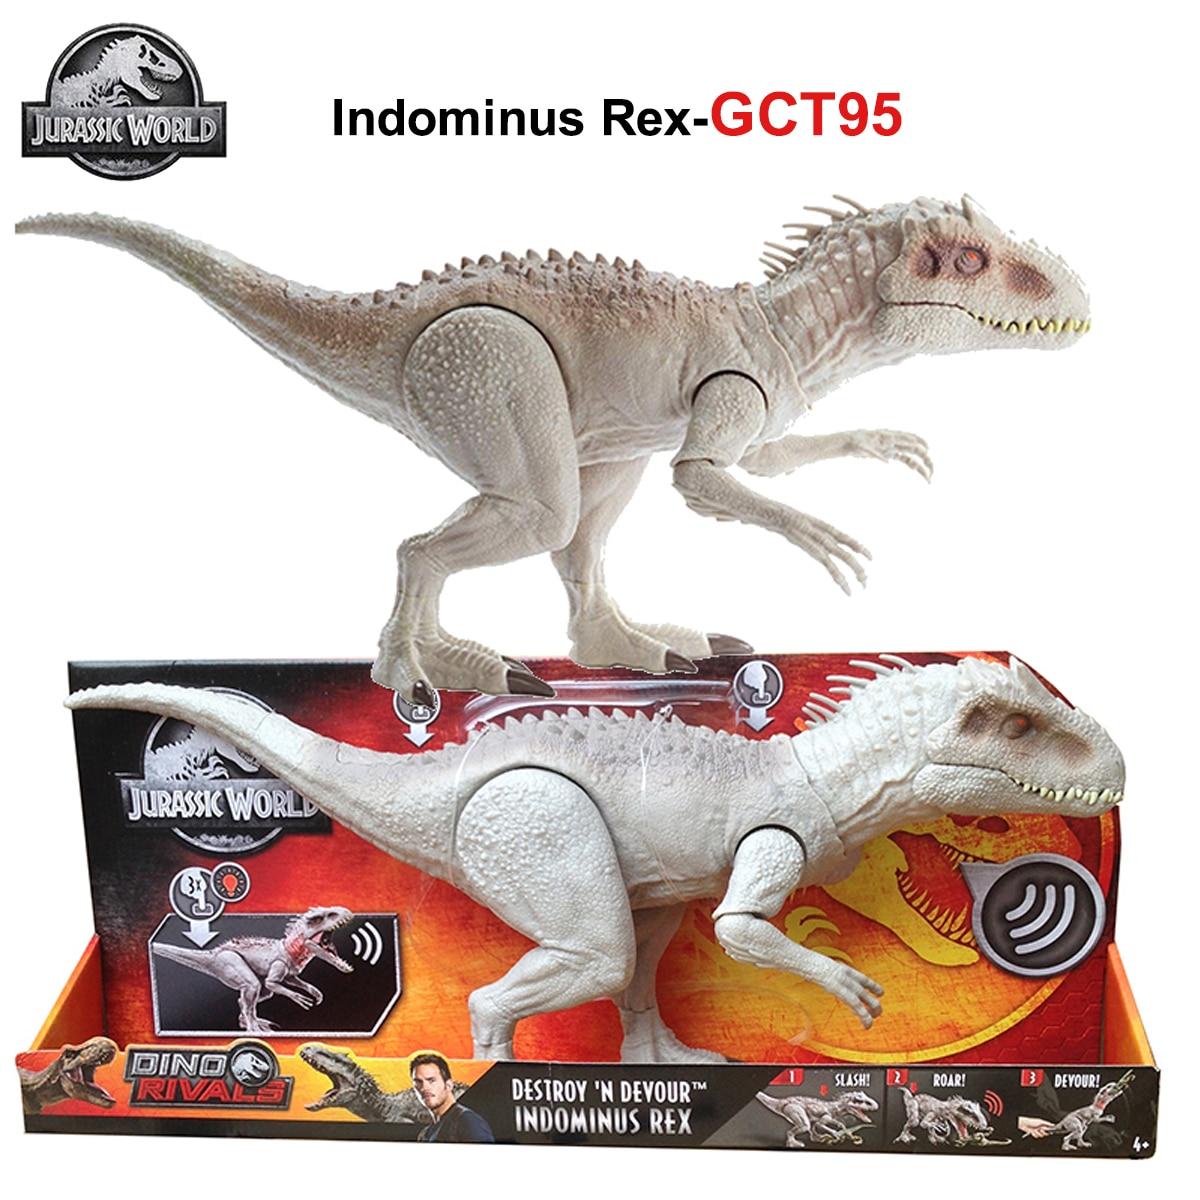 Jurassic World Indominus Rex Dinosaur Toy Tyrannosaurus Biting Movement Ferocious Sound Effect Toys for Kids Birthday Gift GCT95